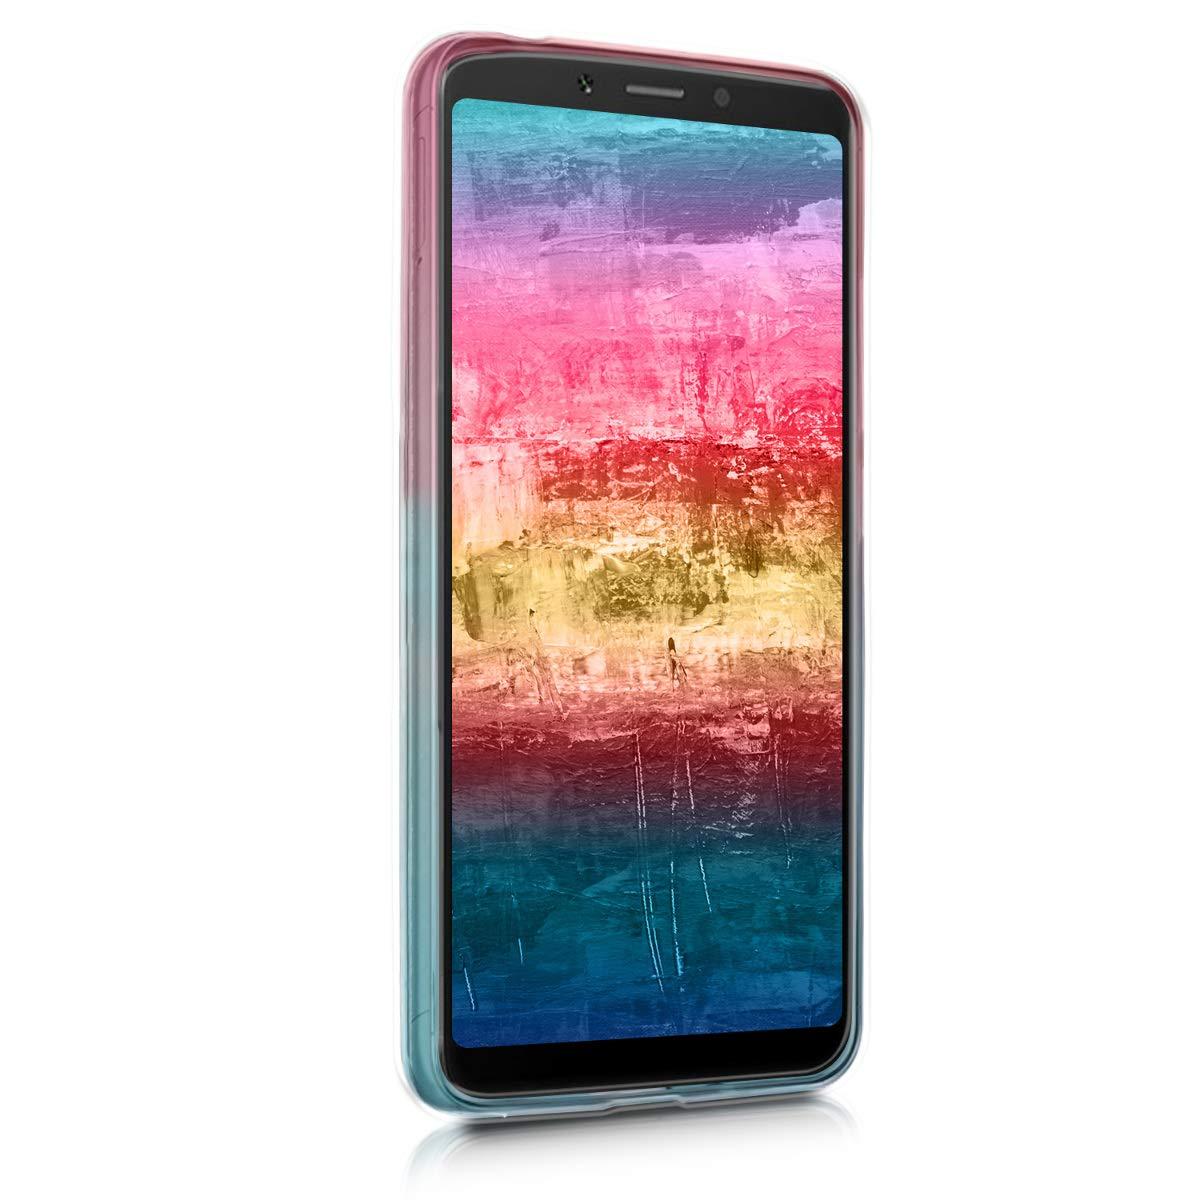 Amazon.com: kwmobile Case for Xiaomi Redmi 6A - Clear TPU ...